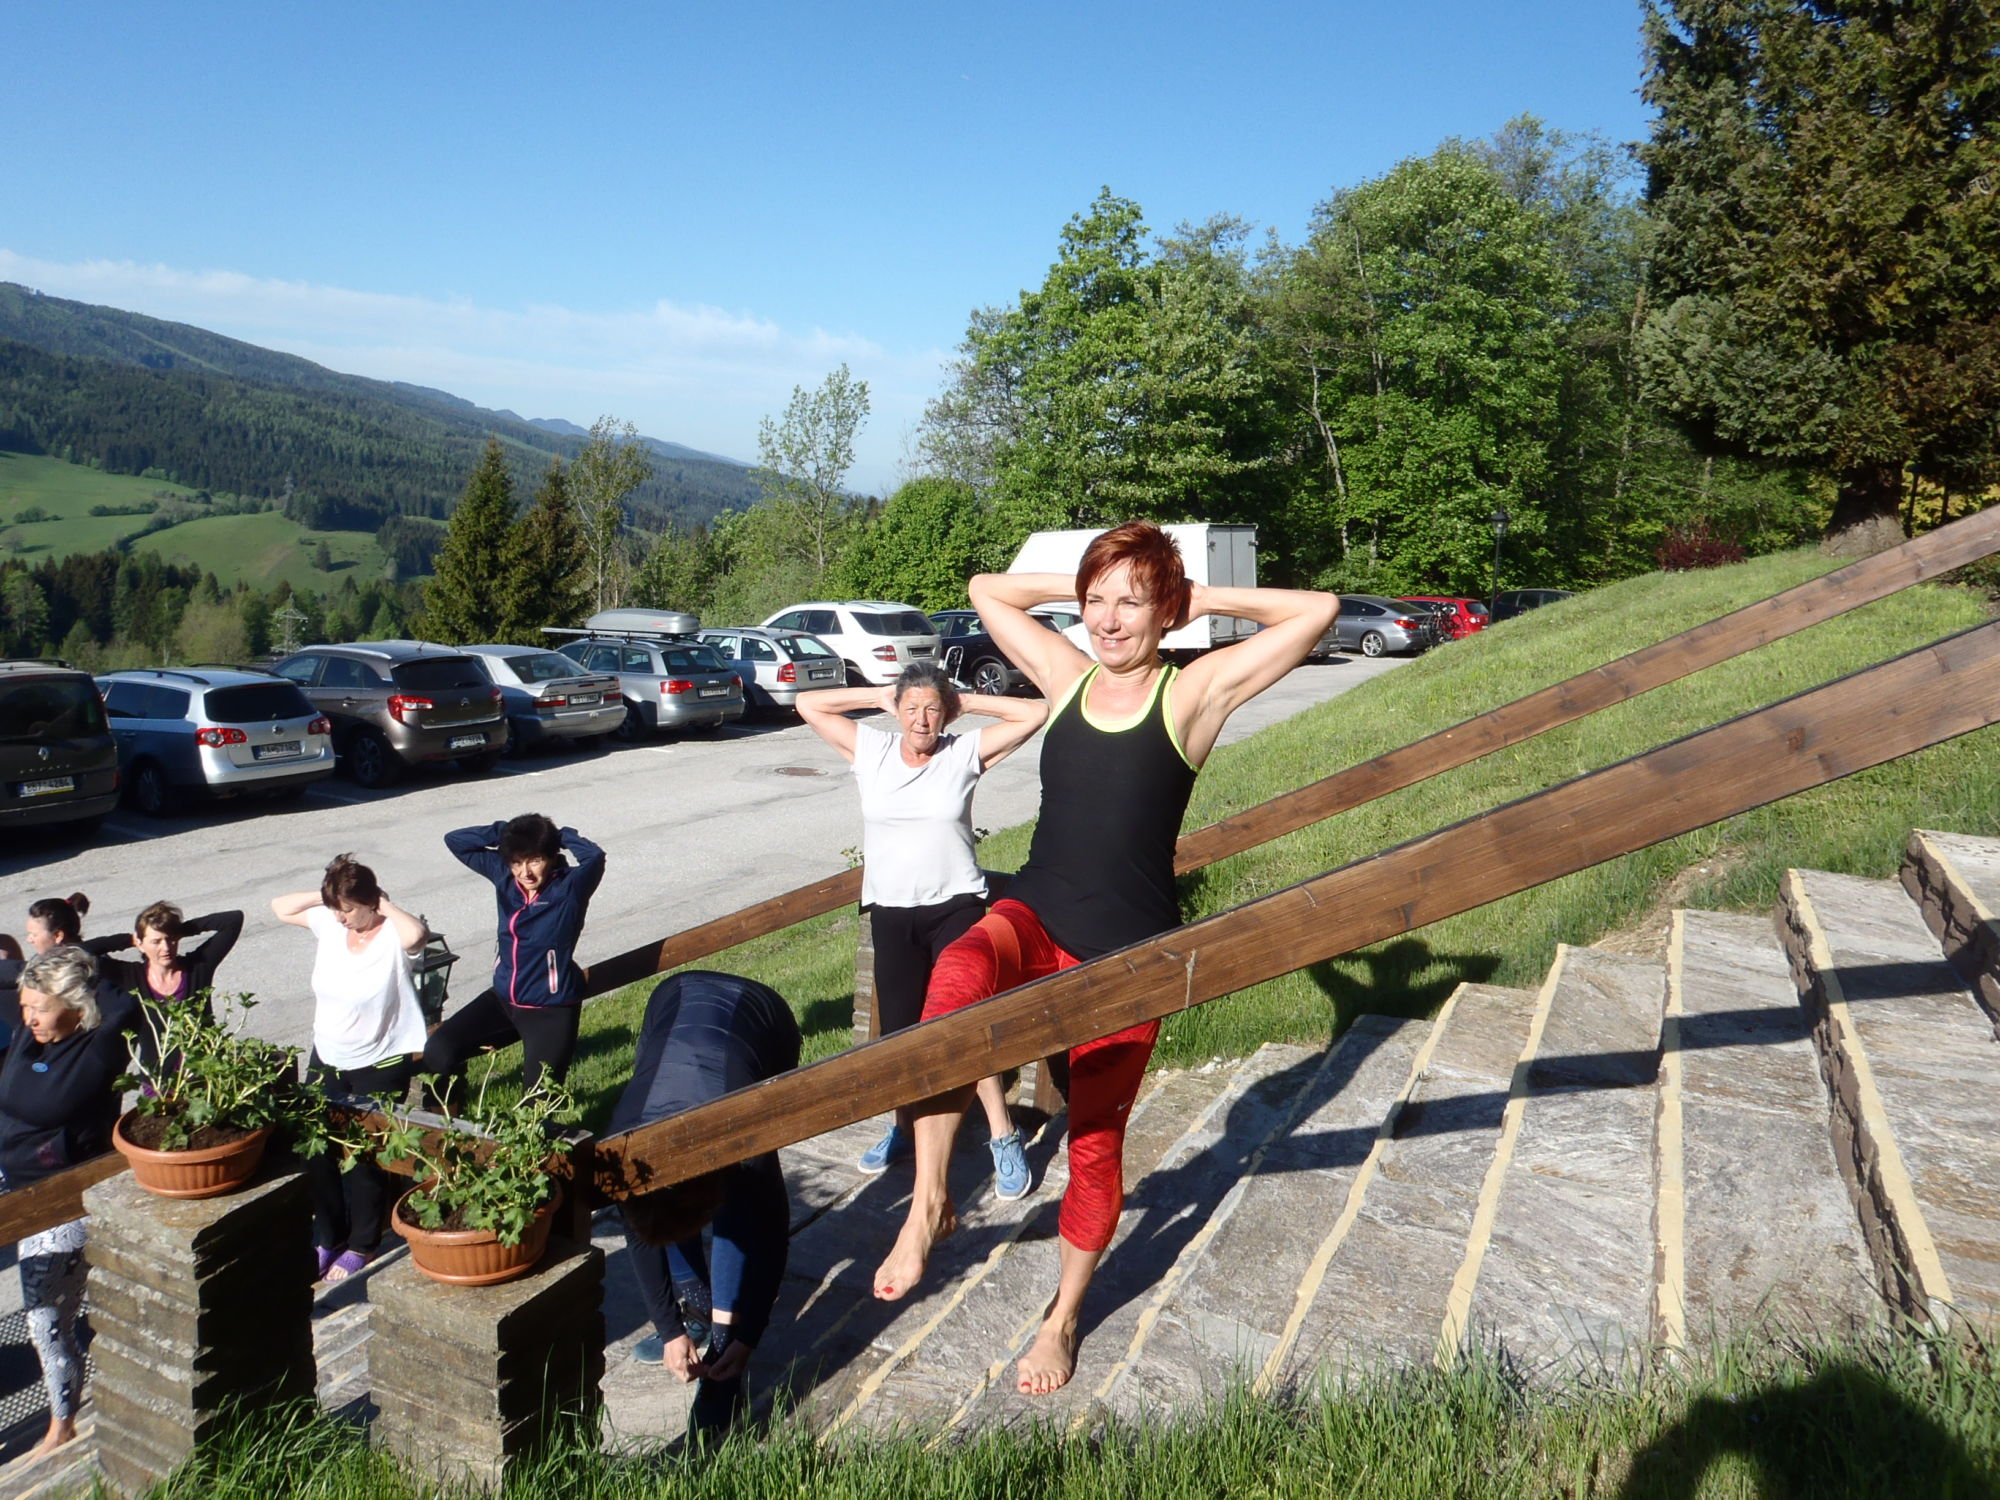 alpenhof-rekondicni-pobyt-fitpainfree-cvicebni-metoda-pomoc-bolest-zada-kycle-kolena-ramena-hanatoufarova-cvicenibrno